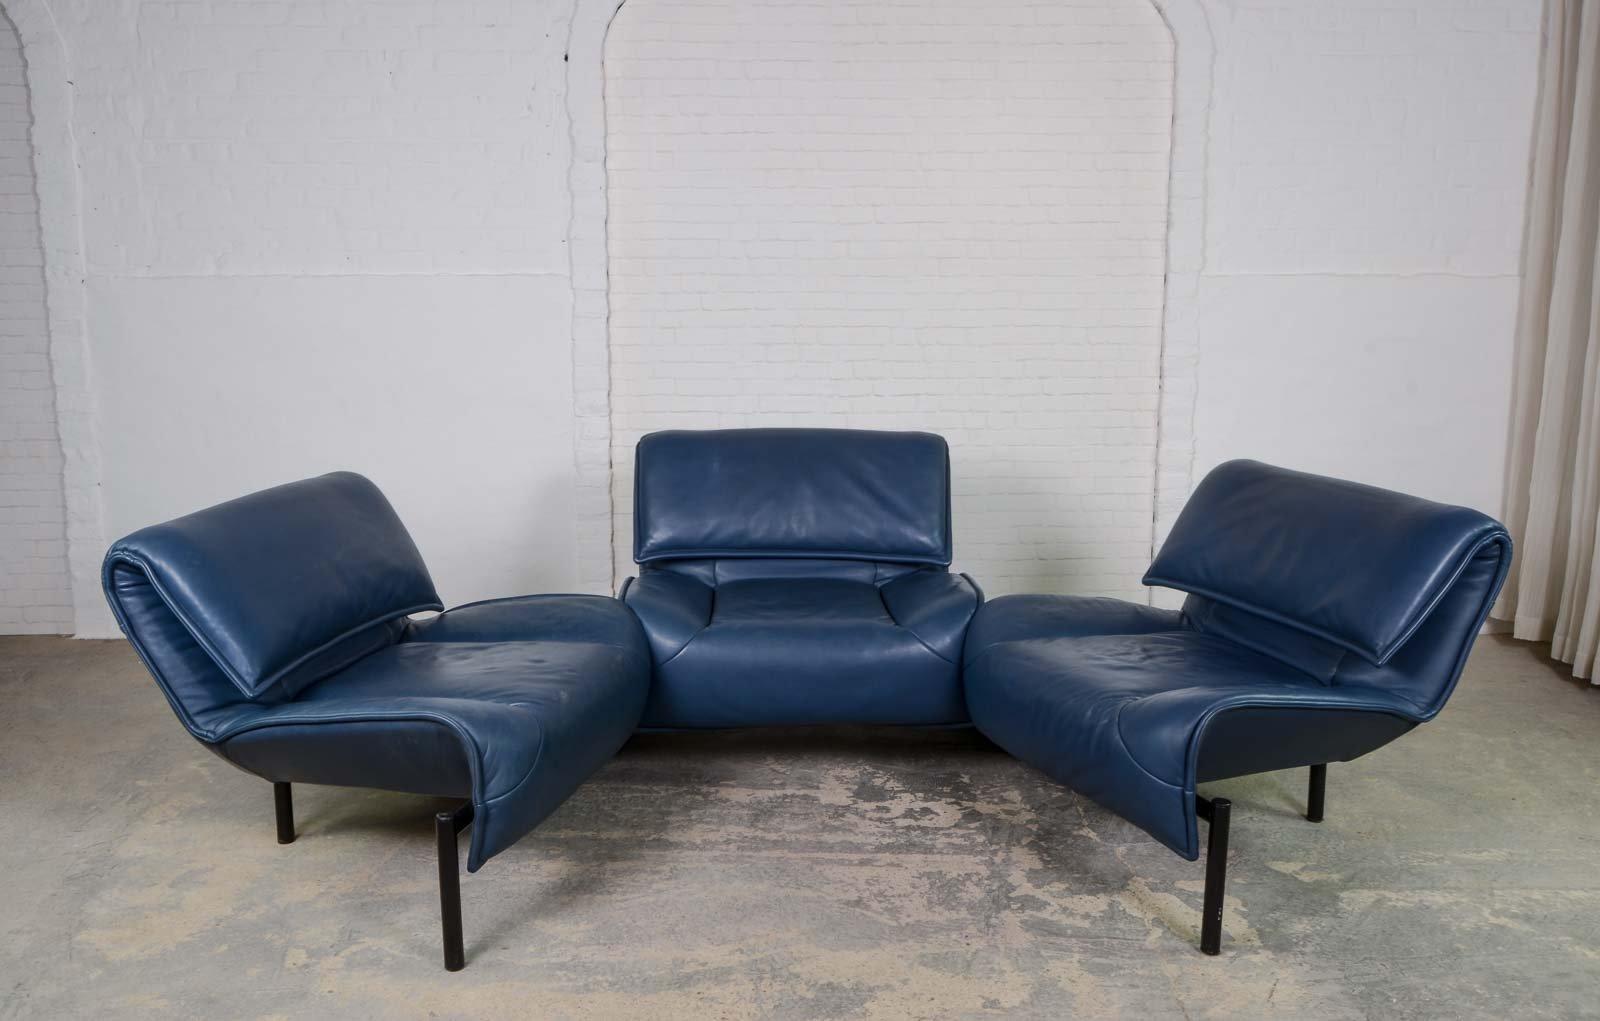 Blaues mid century veranda sofa von vico magistretti f r for Veranda englisch